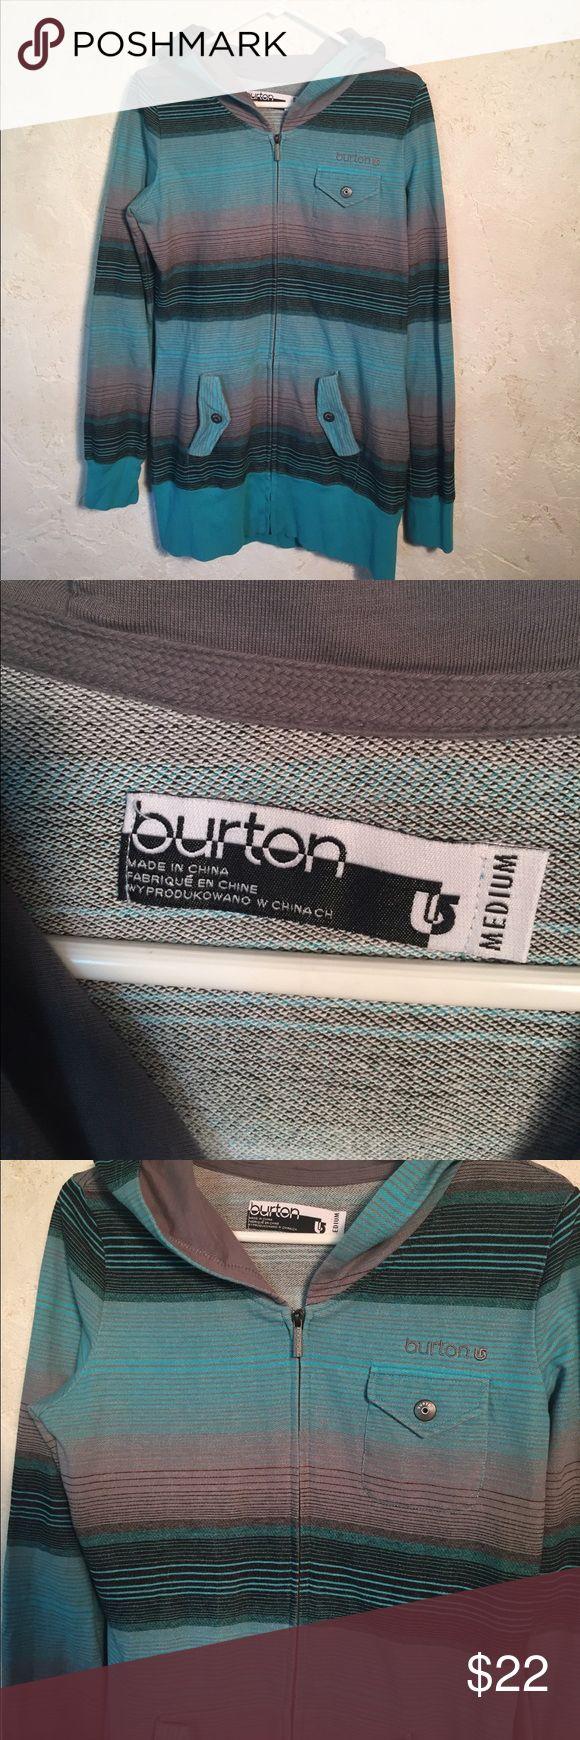 Men's Burton zip hoodie Men's Burton medium zip hoodie. The pocket looks like the stitching might be starting to come loose as seen in photo.              08 Burton Shirts Sweatshirts & Hoodies